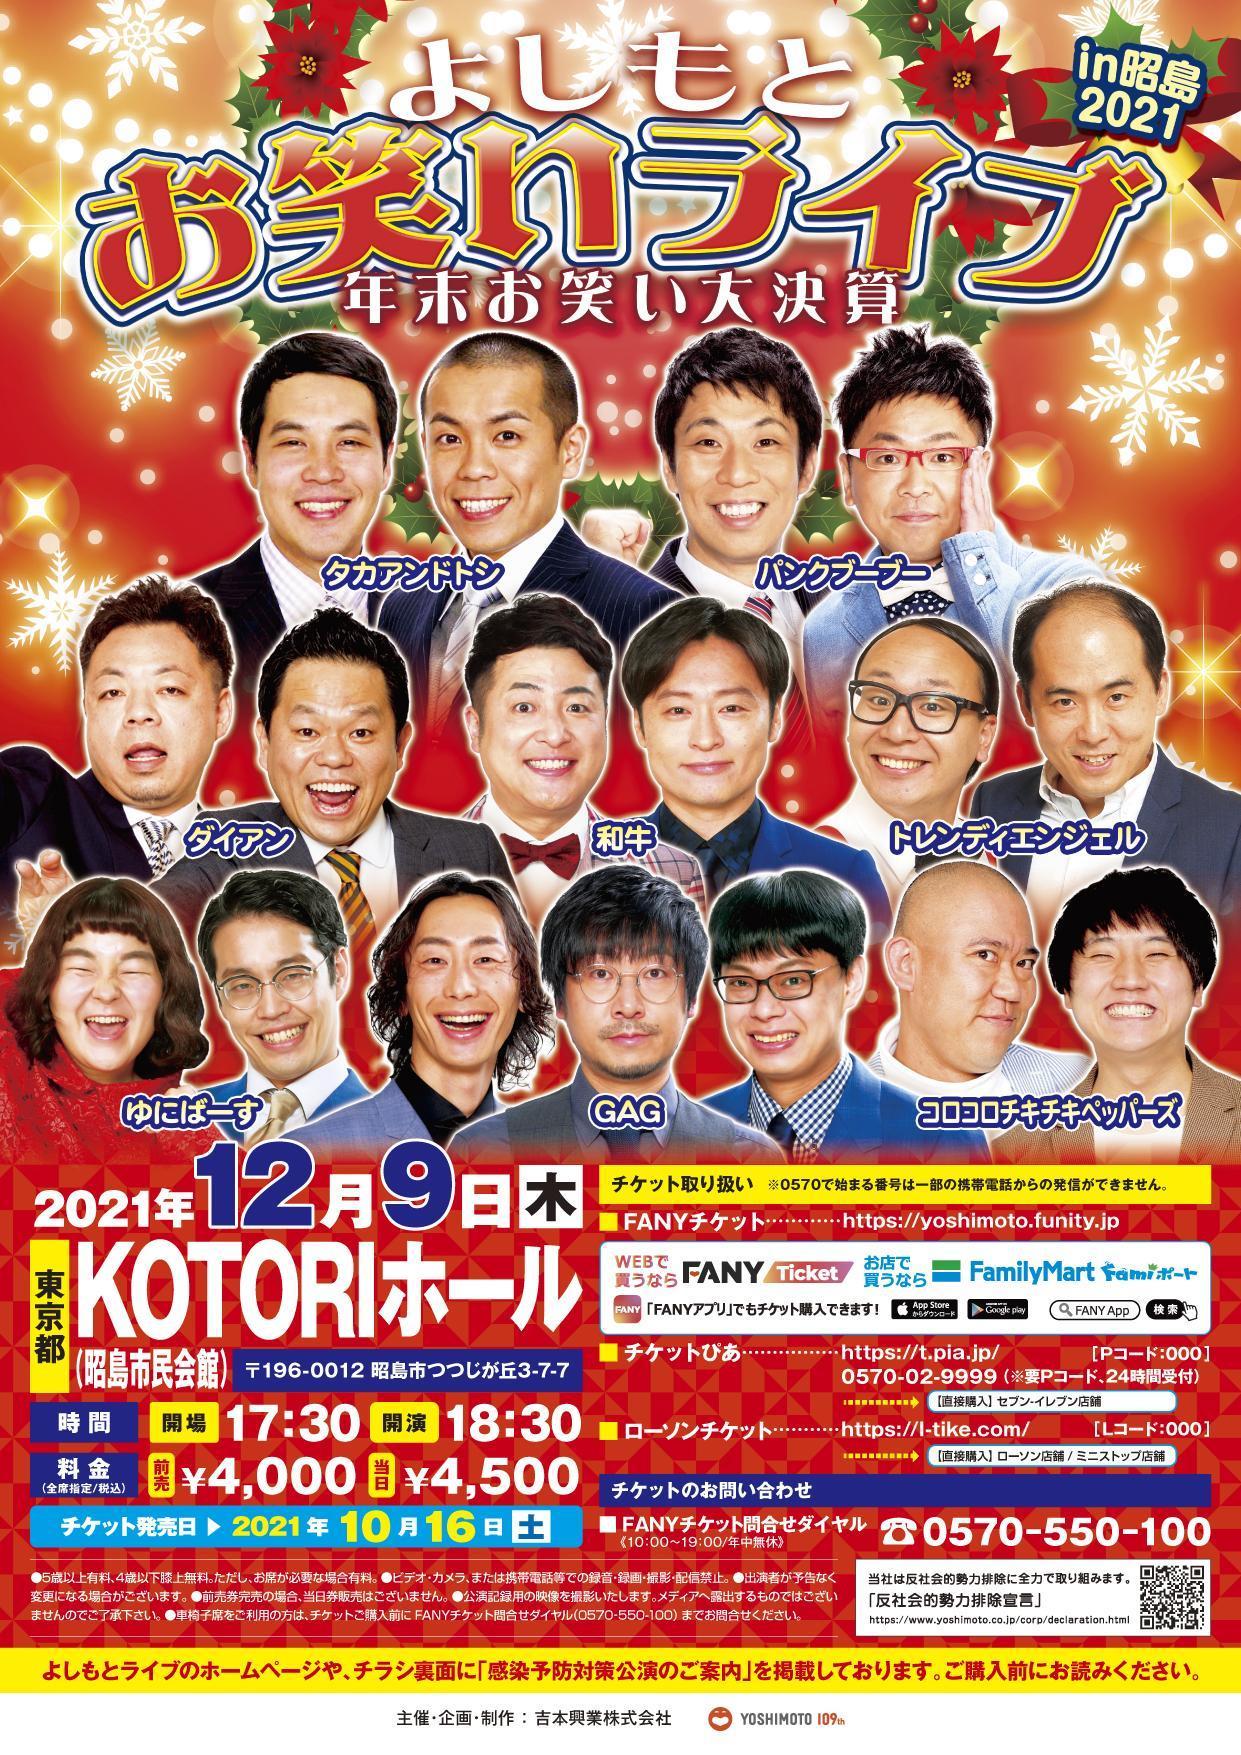 http://www.syumatsu.jp/20211012163828-e6528c1b7686e863d04ef6a9db41da0941882924.jpg